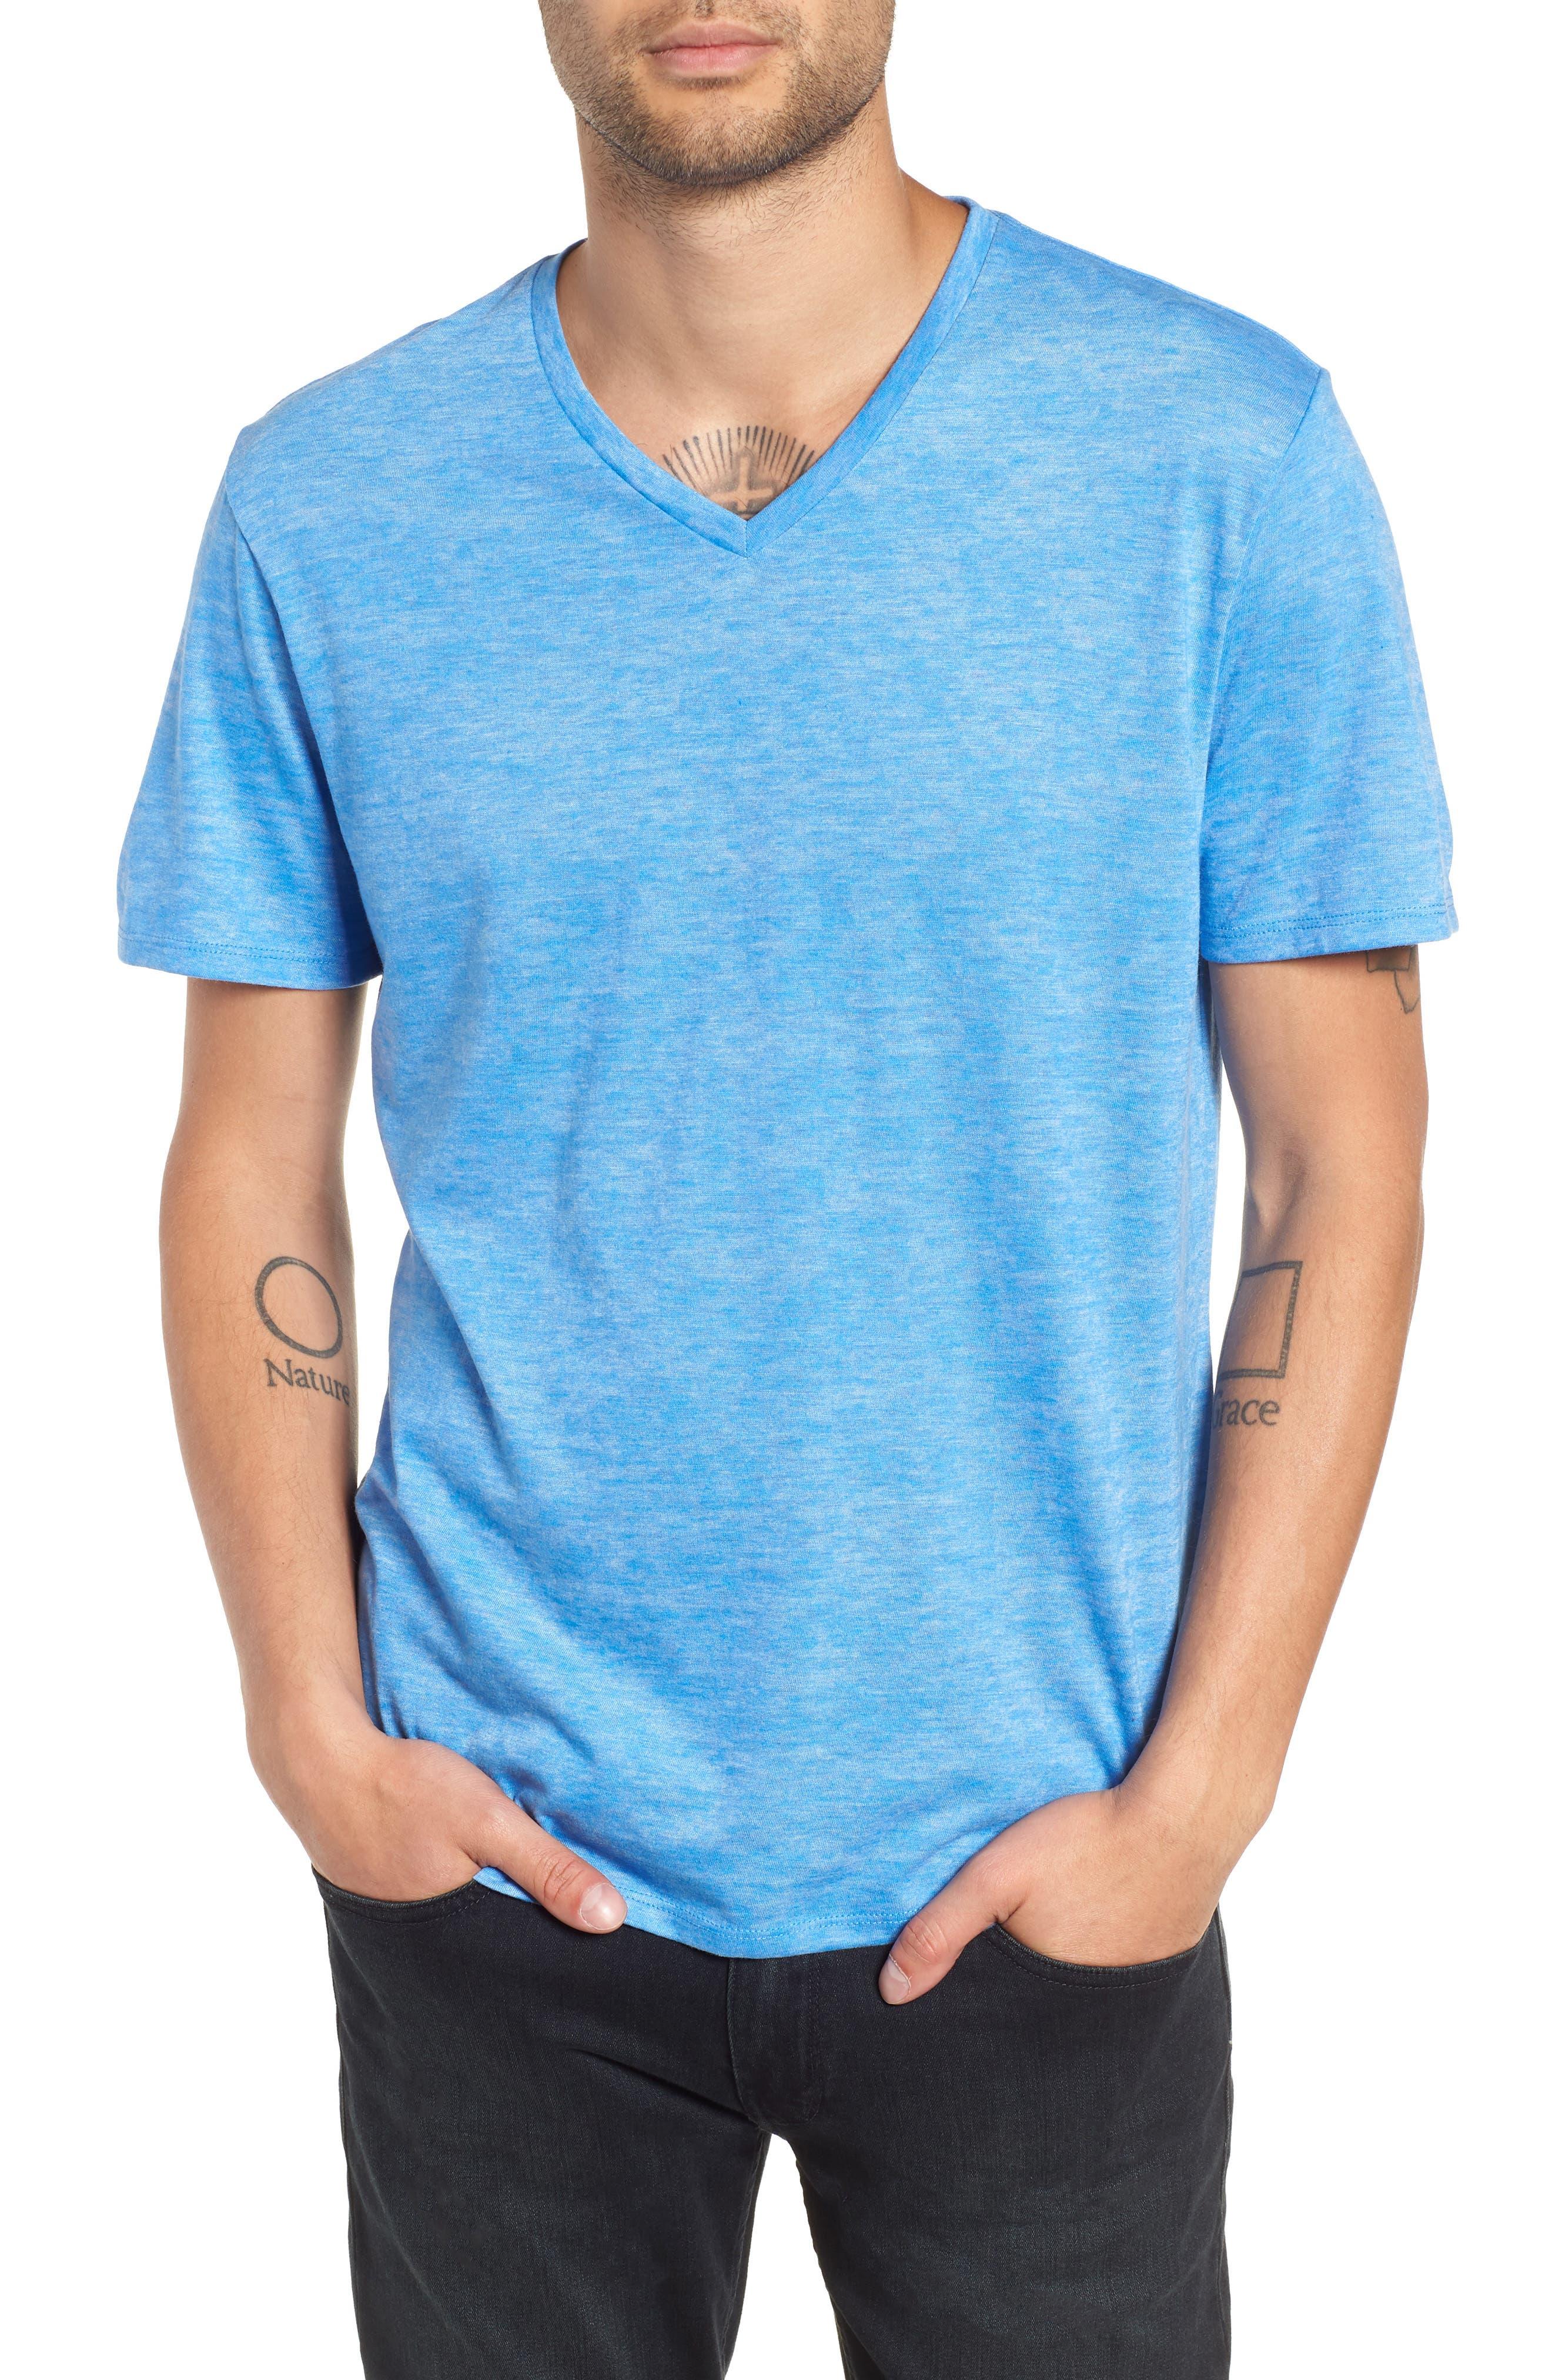 Burnout V-Neck T-Shirt,                             Main thumbnail 1, color,                             BLUE BLISS- WHITE BURNOUT